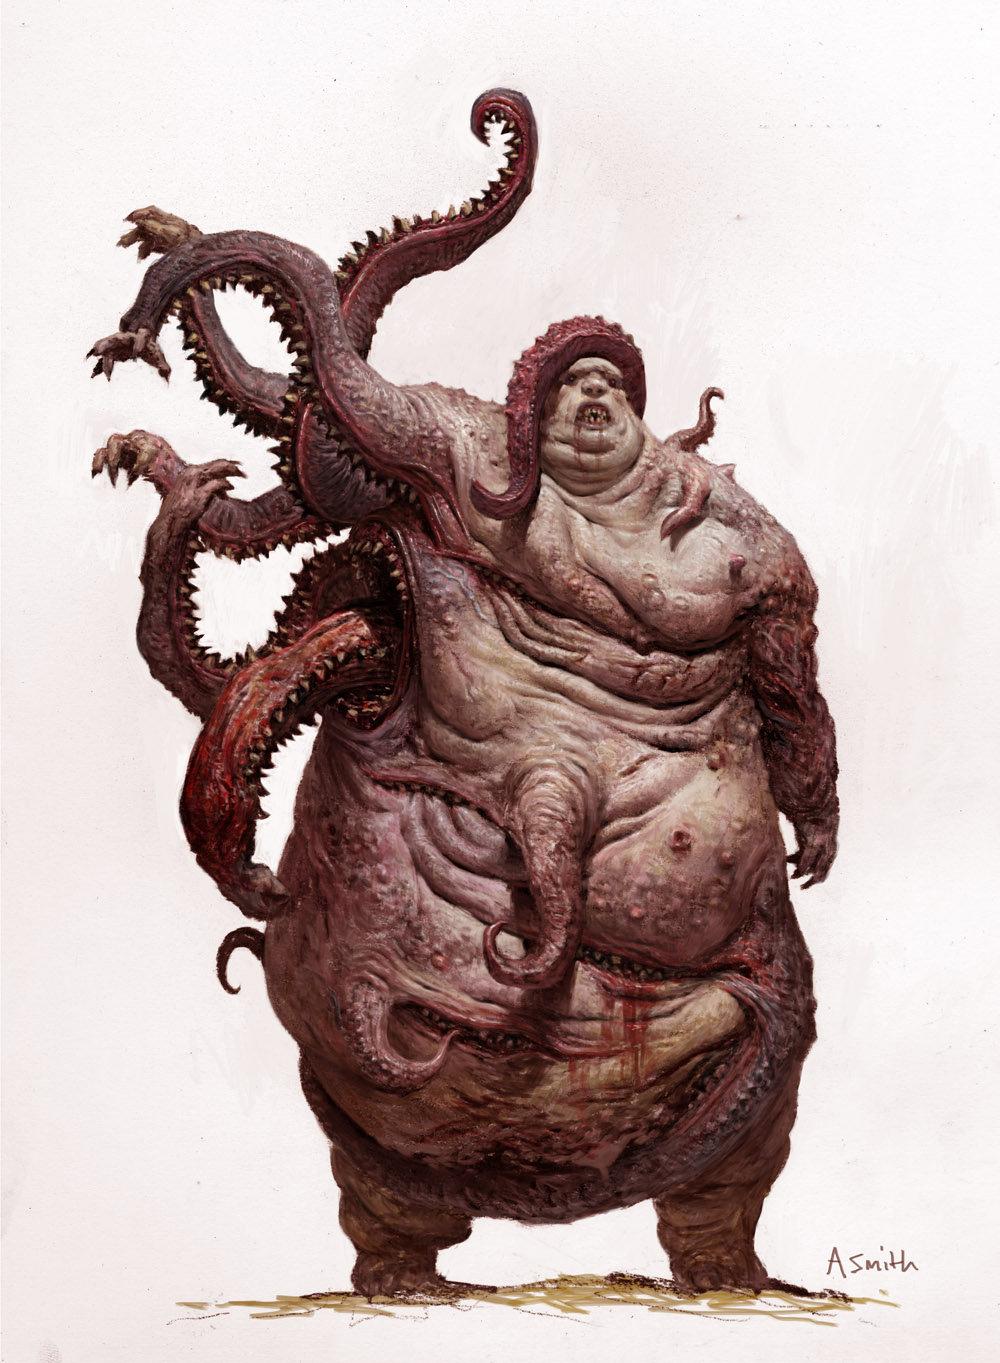 Adrian smith monster6 gluttony